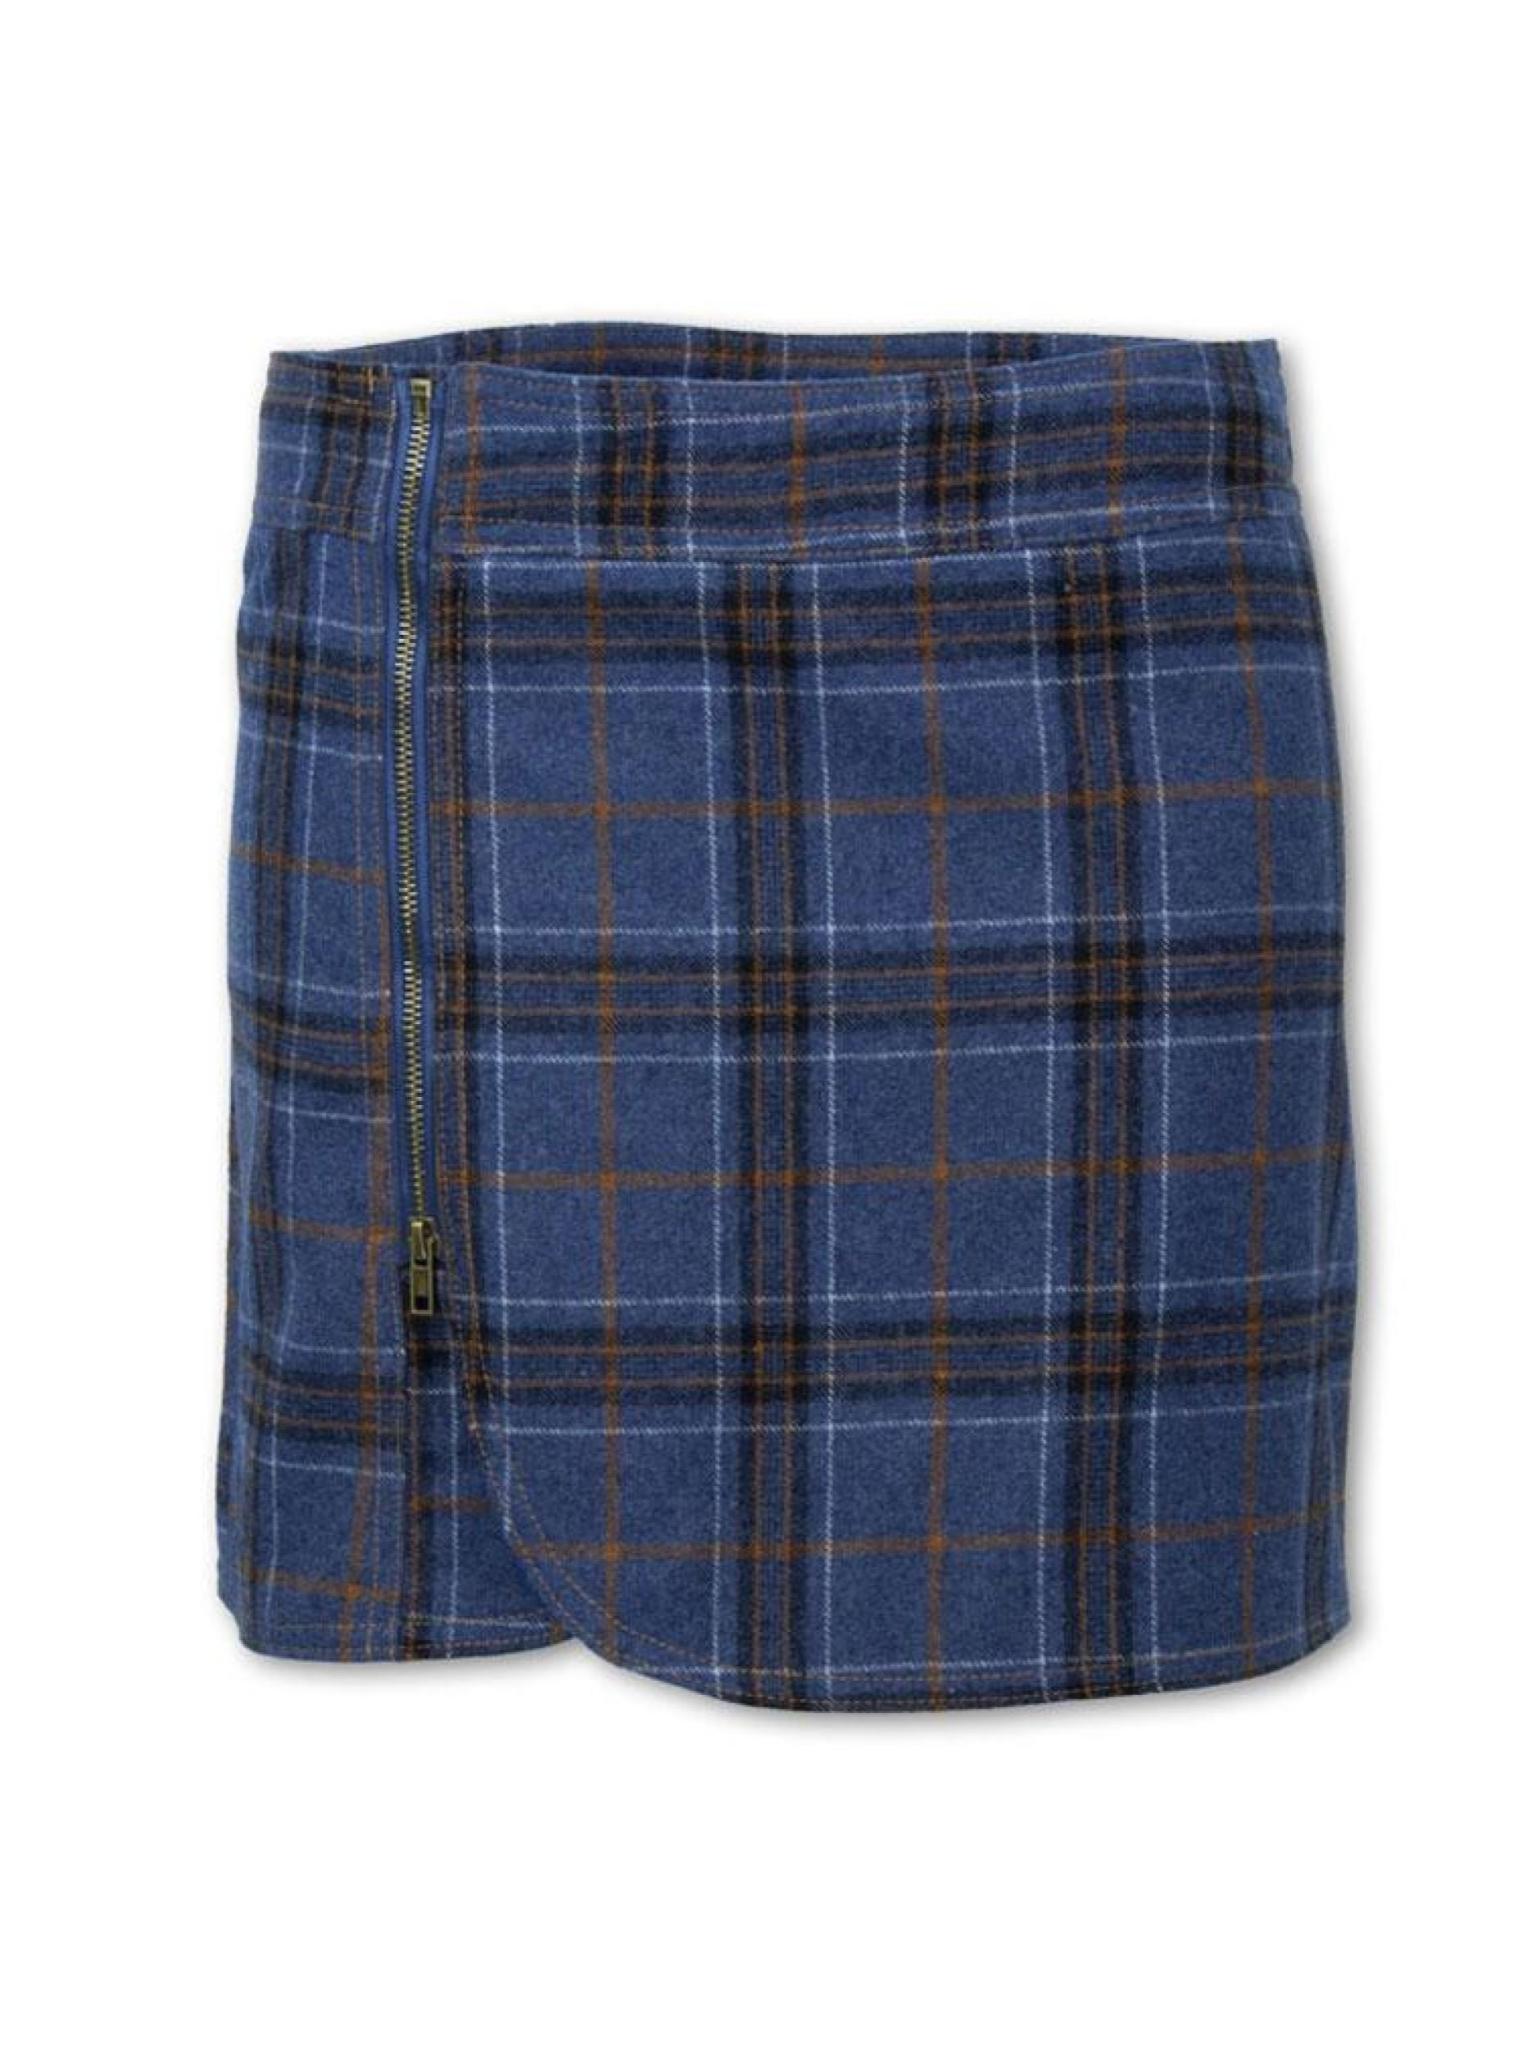 Purnell Women's Plaid Wool Zip Skirt